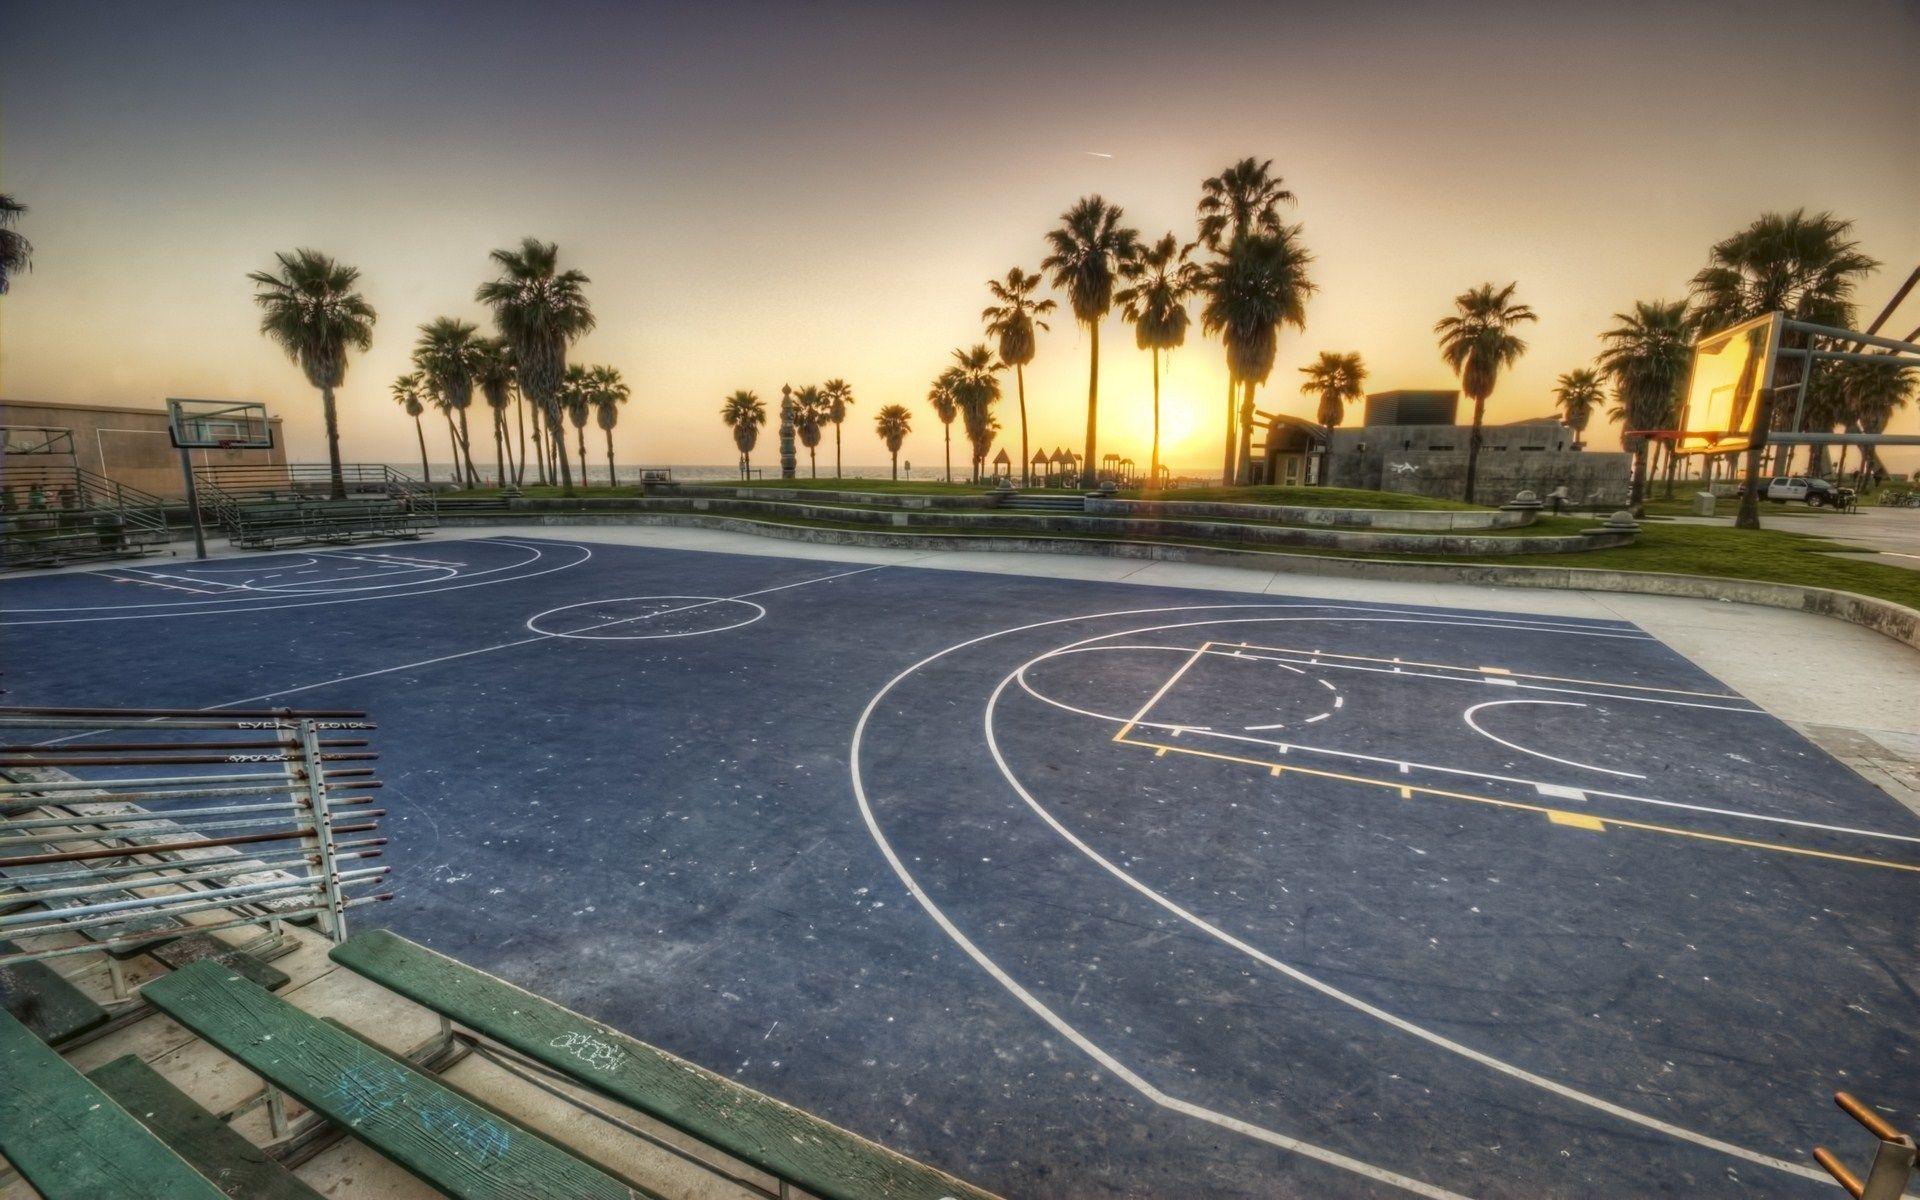 Venice beach sunset basketball los angeles california la usa 1920x1200